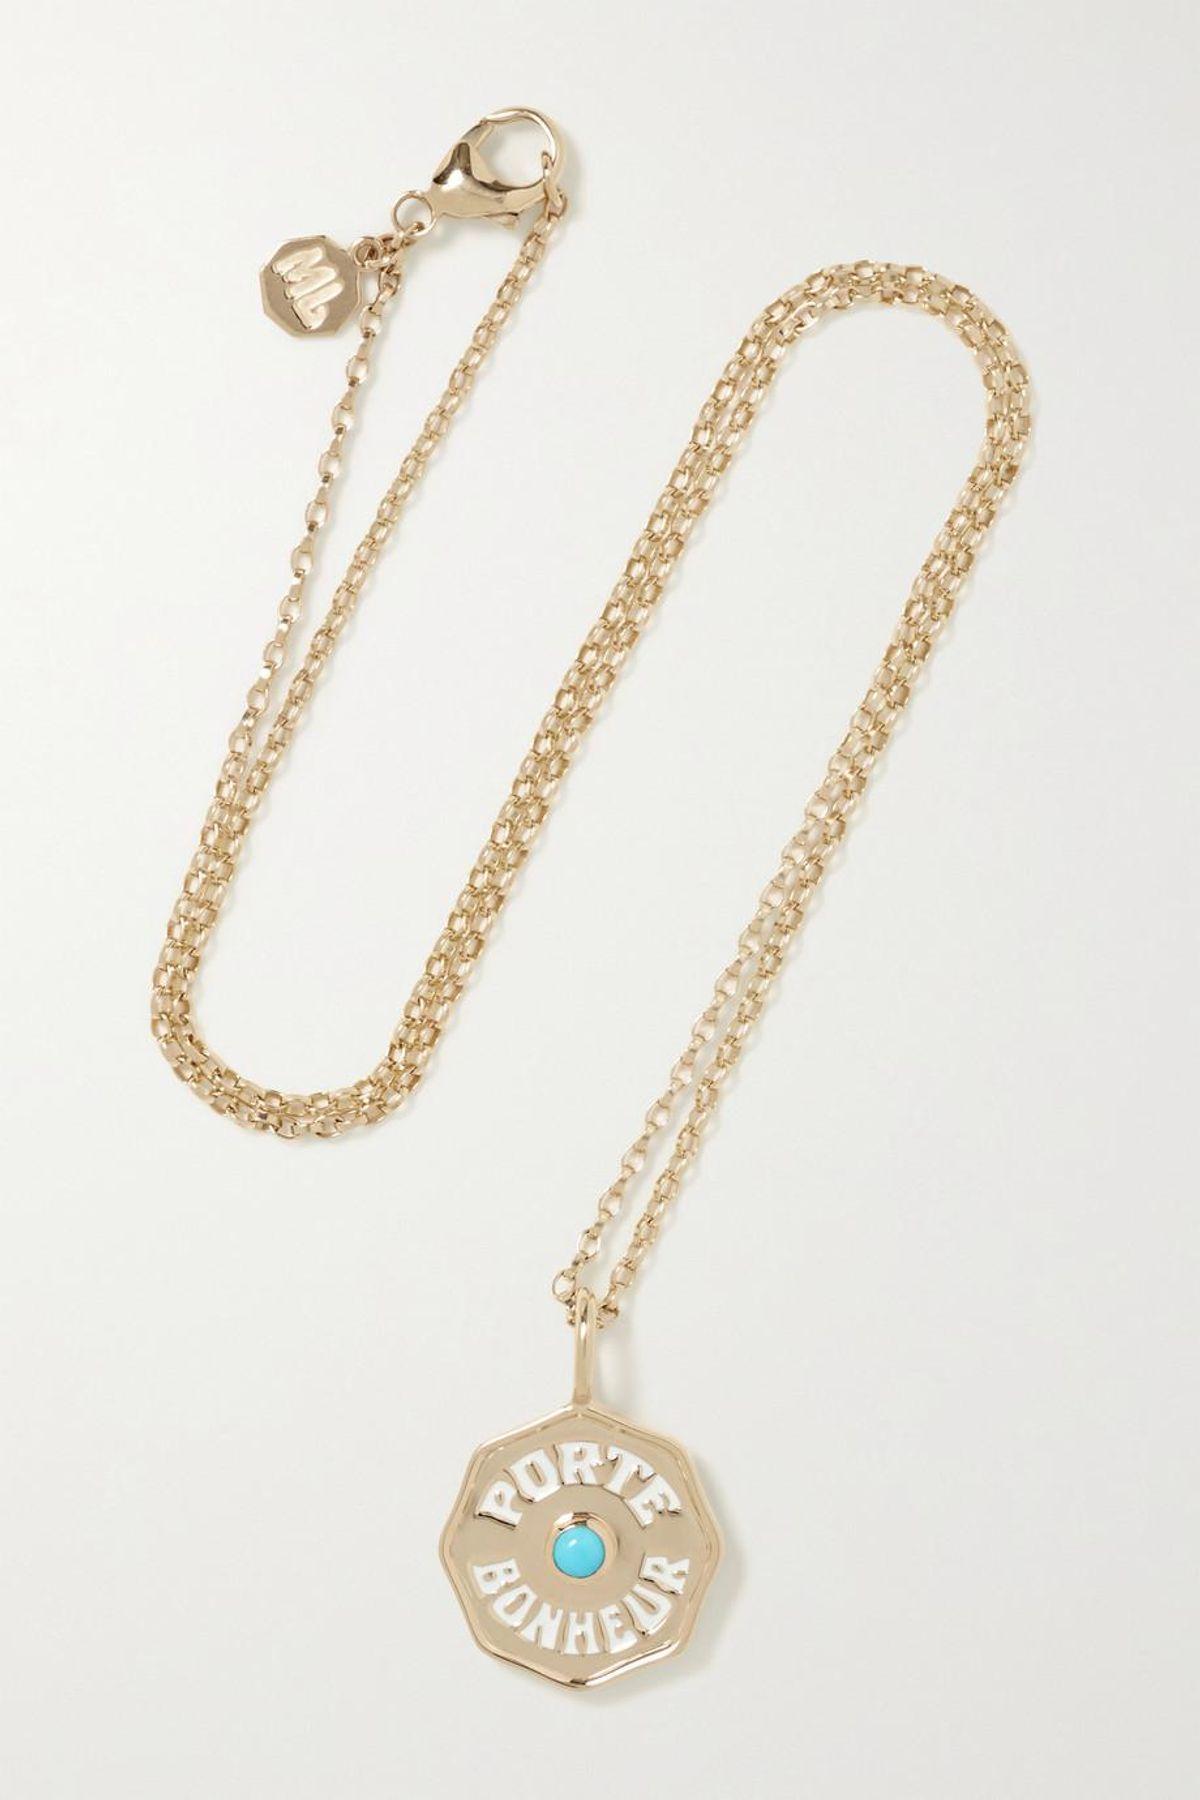 Mini Porte Bonheur Coin 14 Karat Gold Enamel and Turquoise Necklace